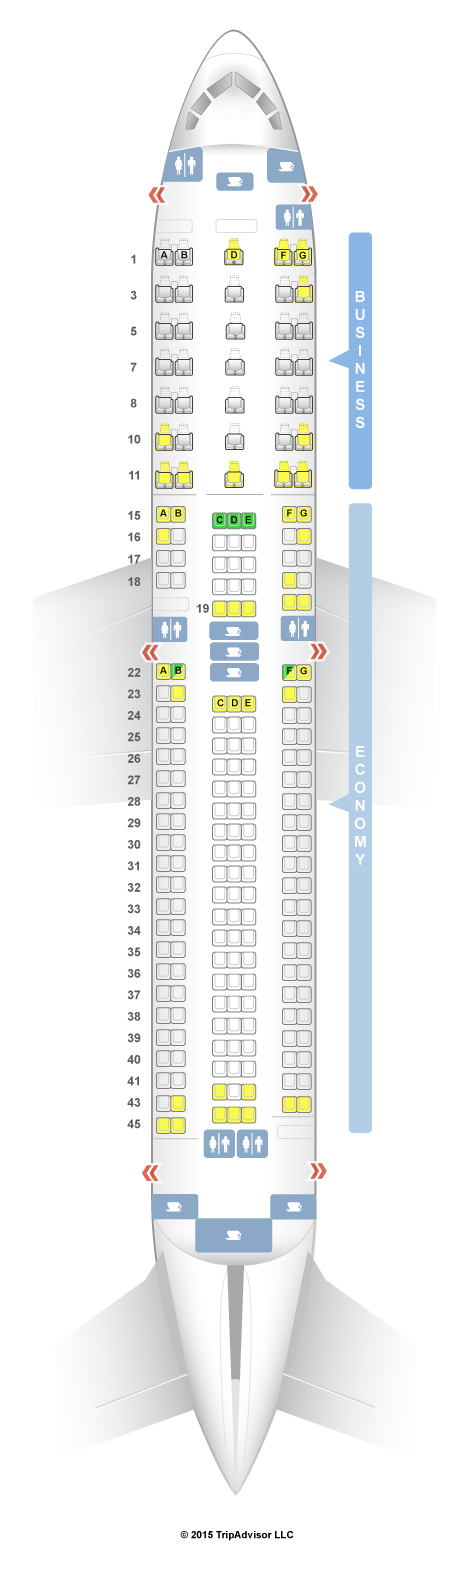 American Standard Toilet Seats >> SeatGuru Seat Map ANA Boeing 767-300ER (763) V2